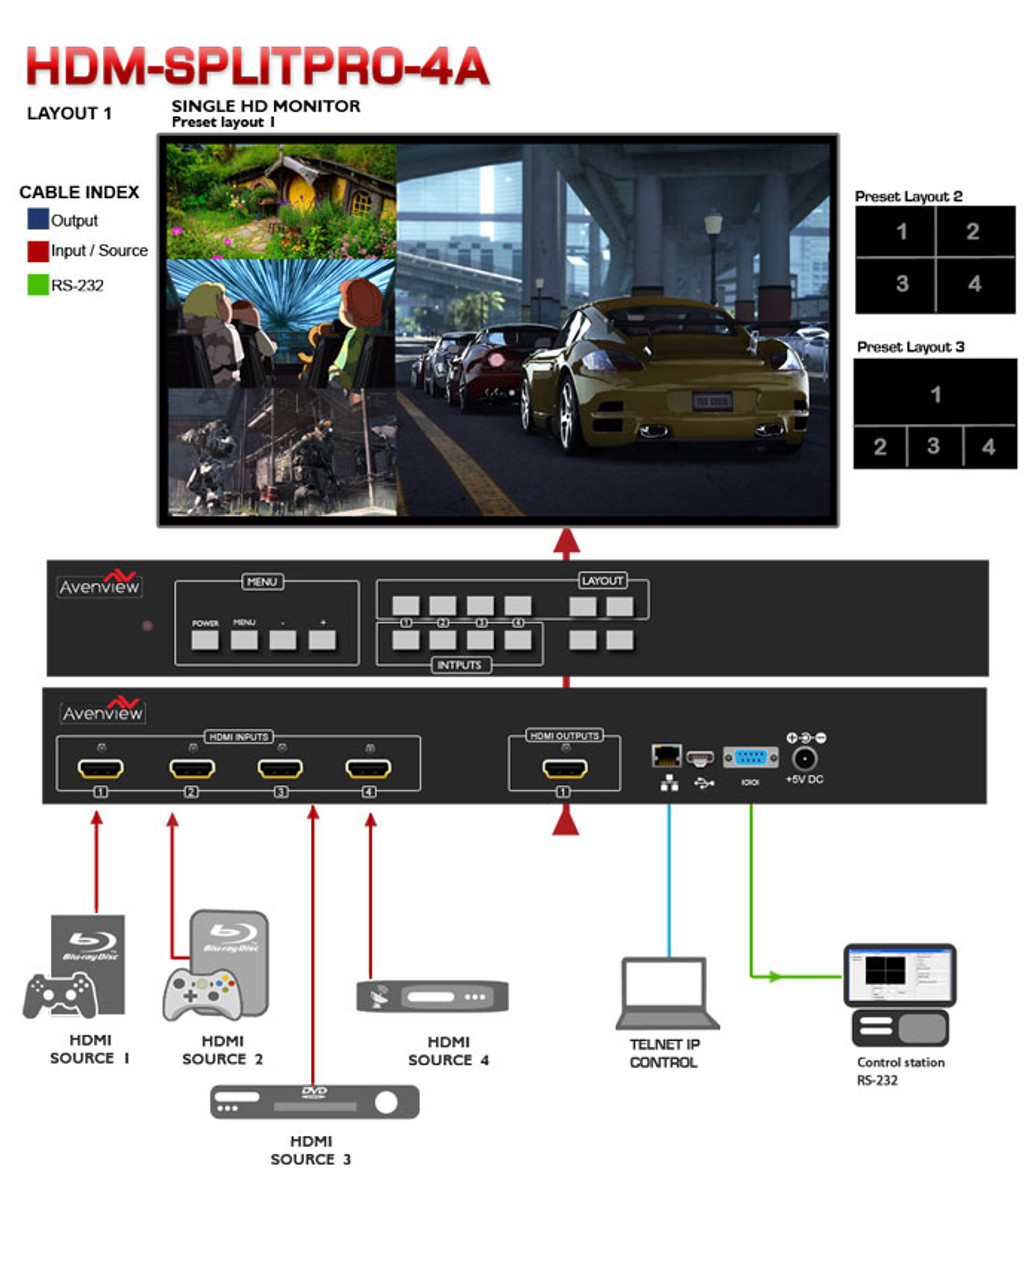 Avenview SPLITPRO 4x1 HDMI Quad MultiViewer (HDM-SPLITPRO-4A)